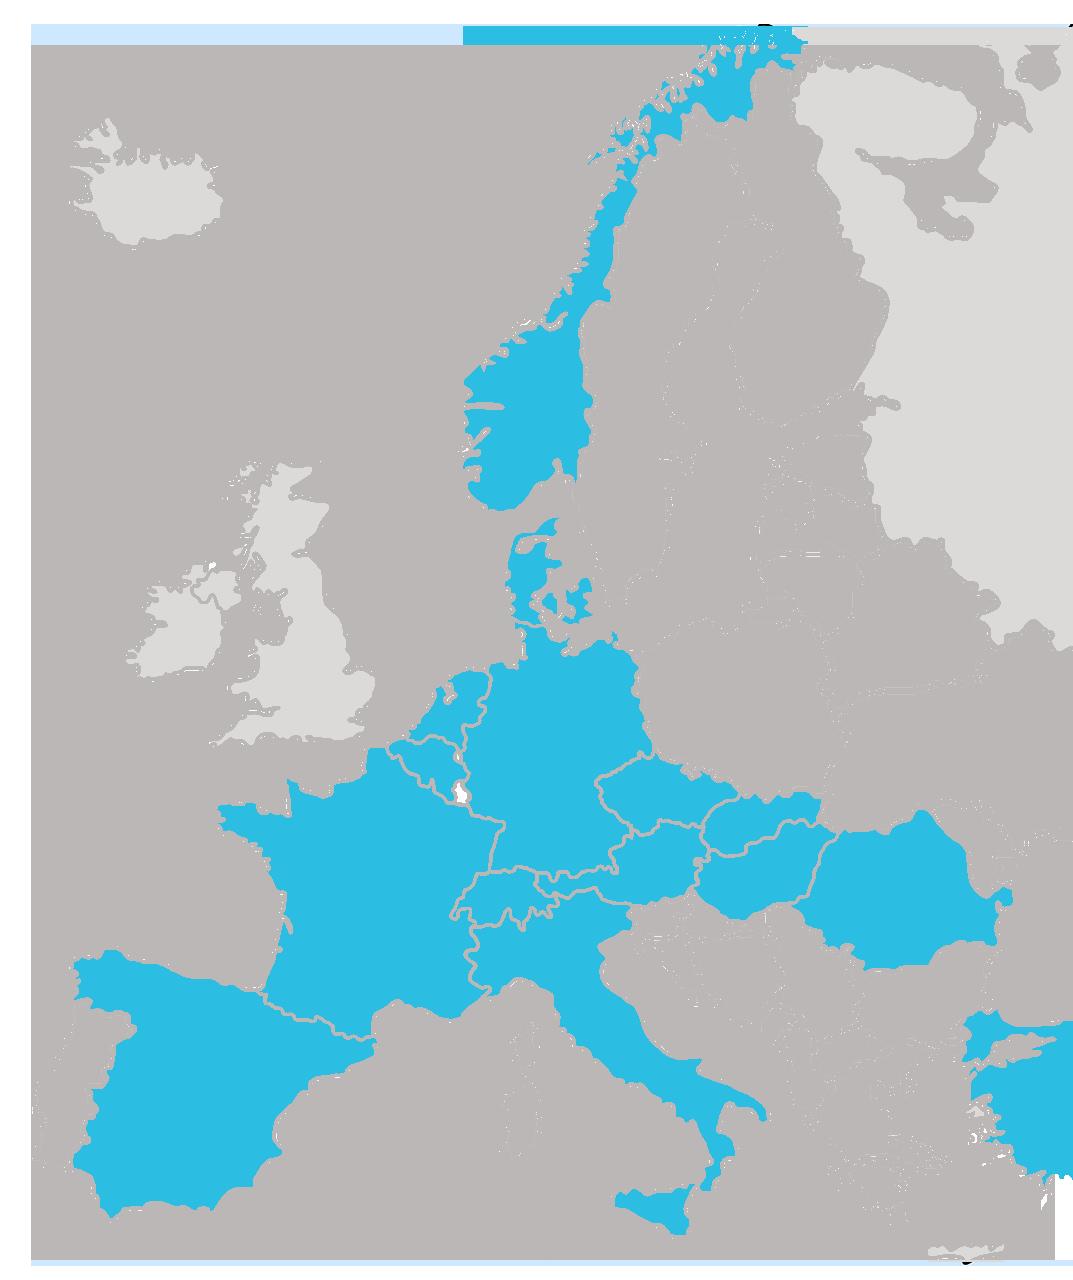 Karte Bunzl Continental Europe 2